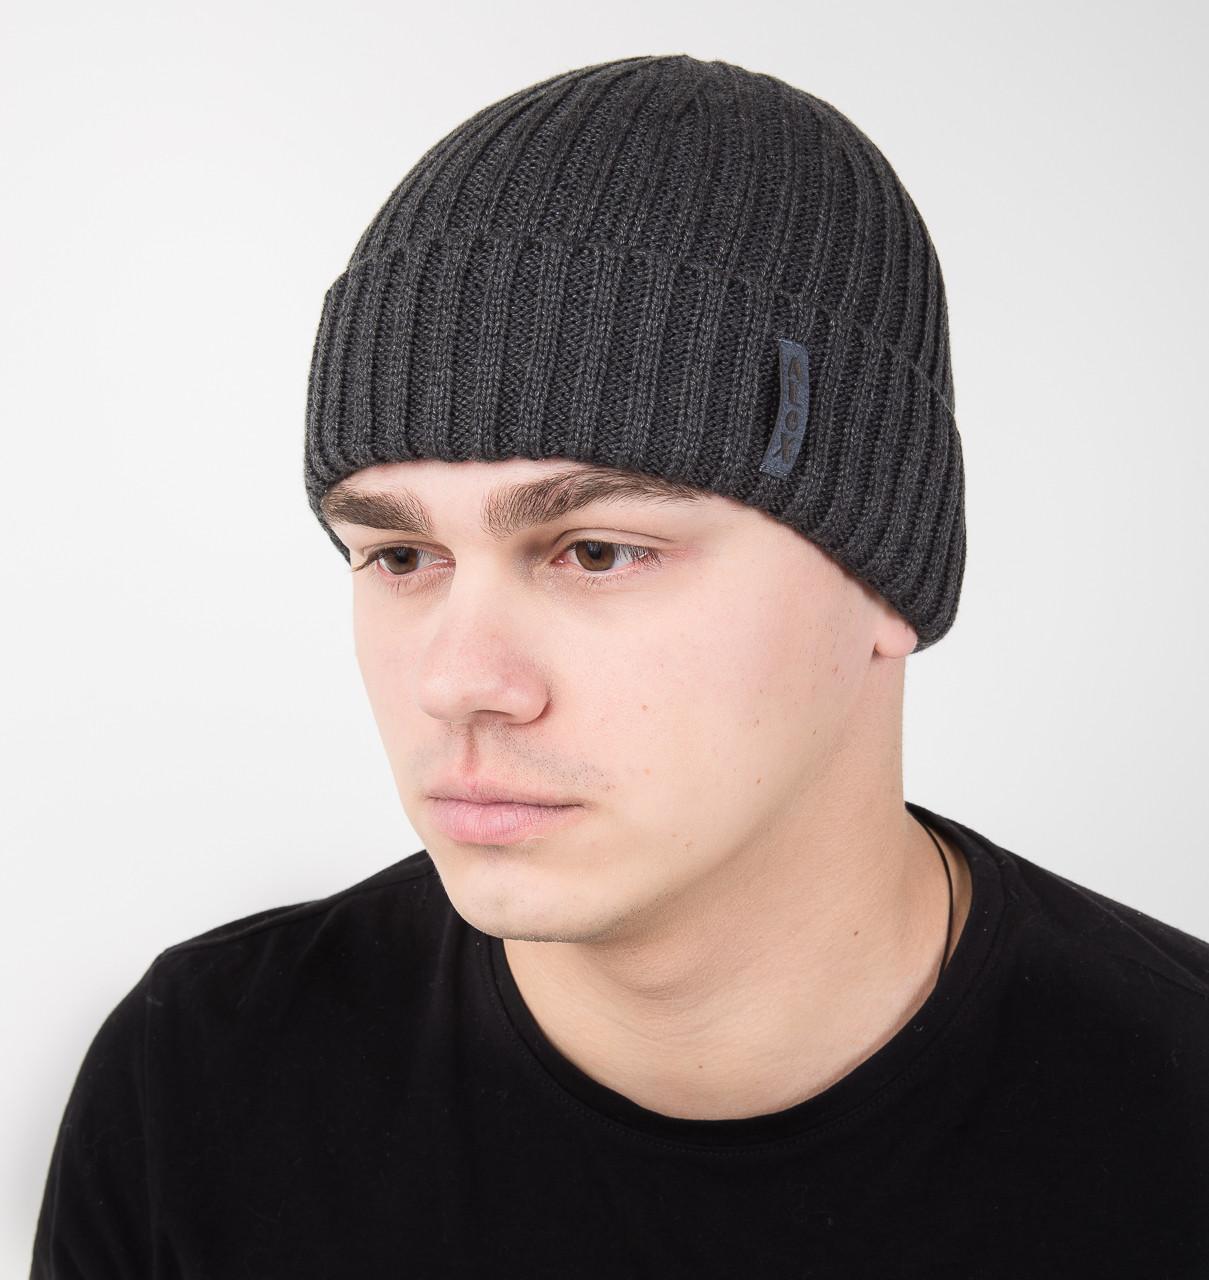 Вязаная мужская шапка с отворотом на флисе - Артикул AL17030